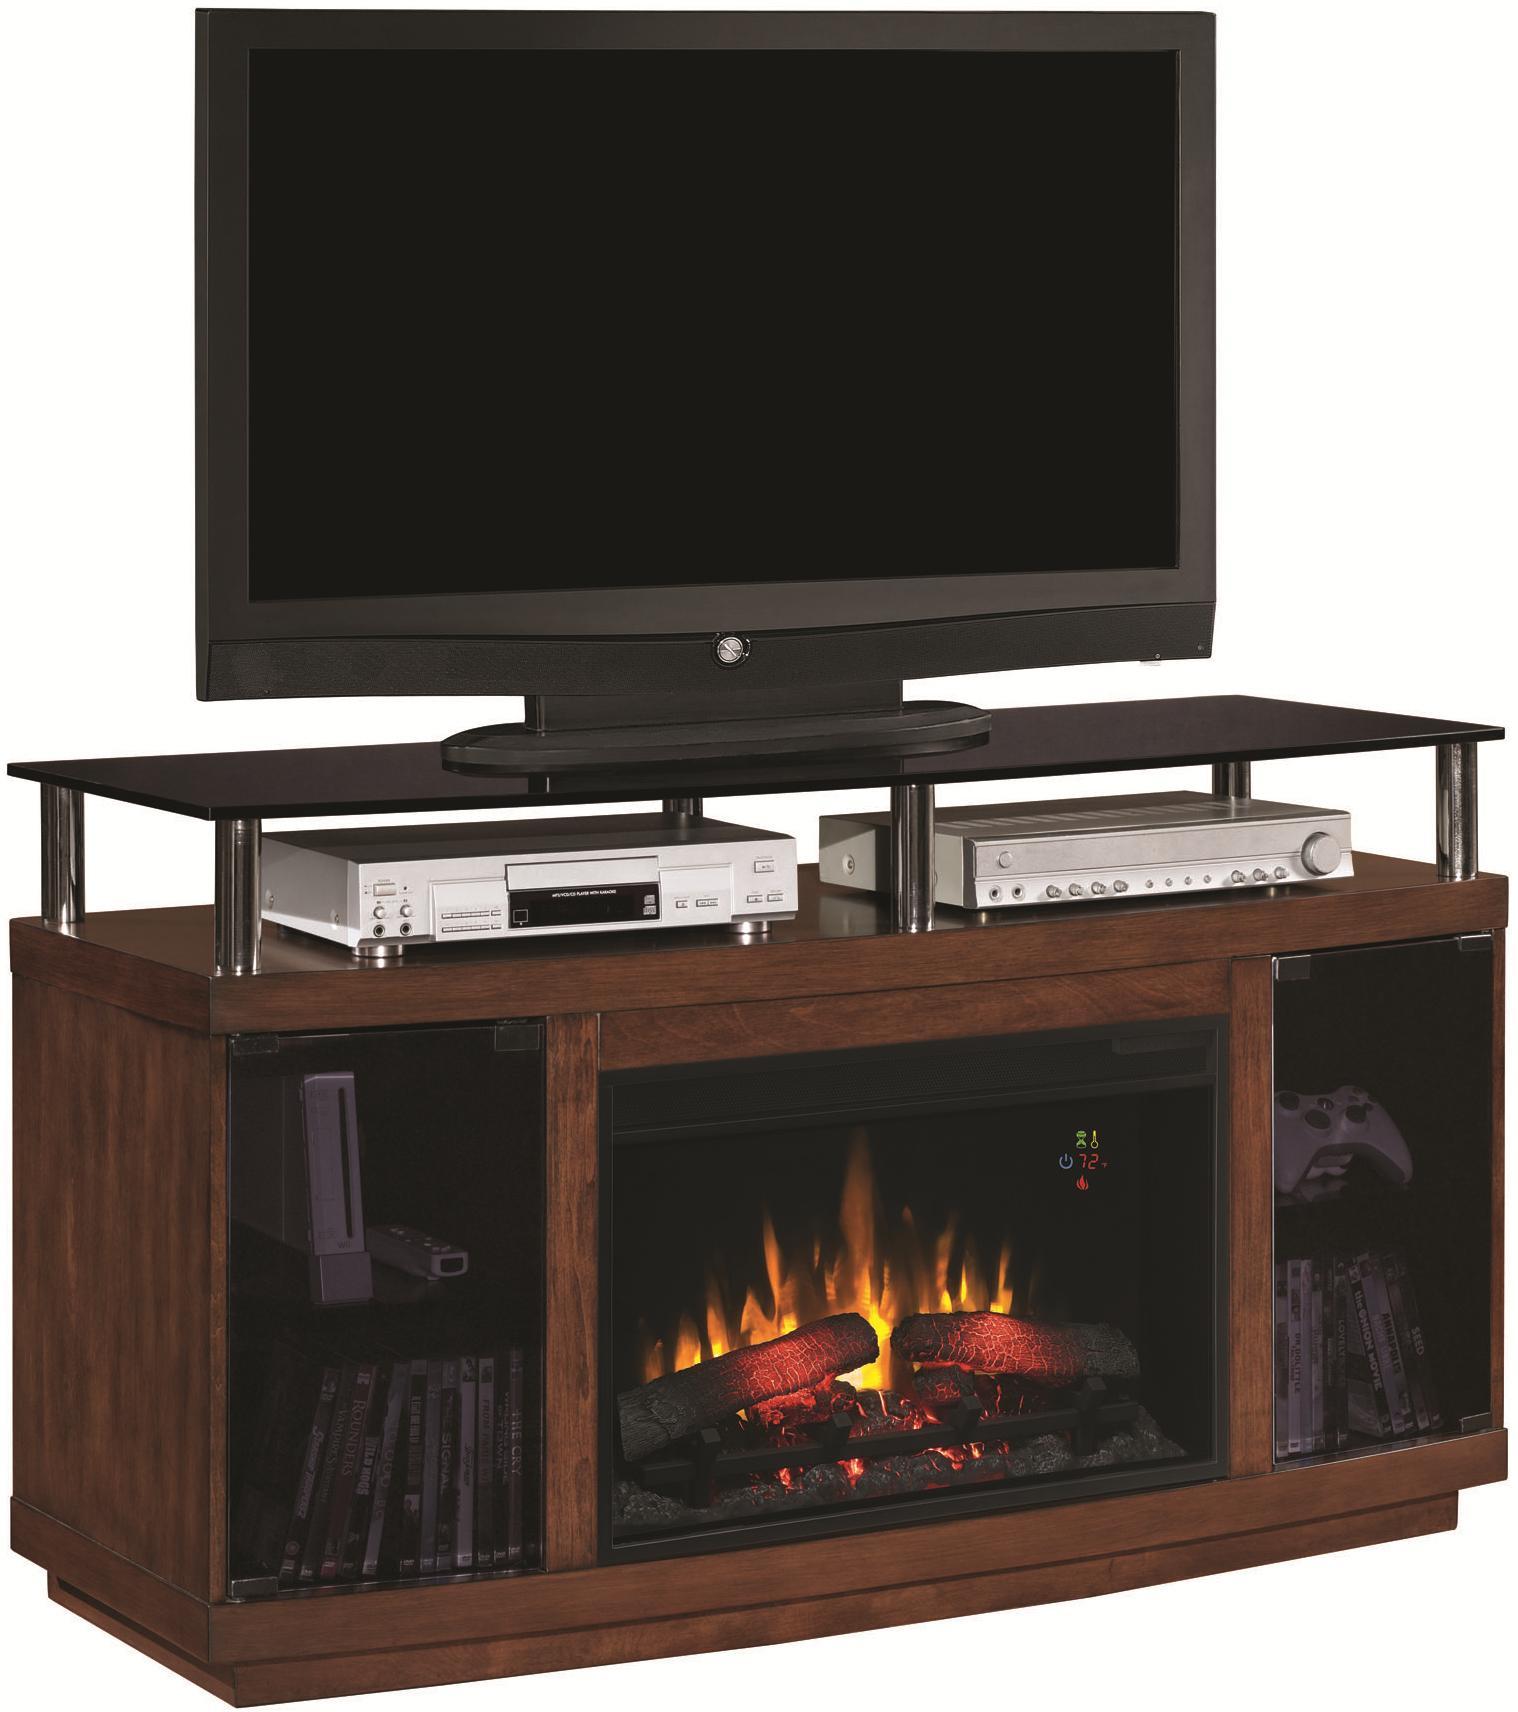 ClassicFlame Drew Drew Electric Fireplace - Item Number: 26MM9405-W324+26EF023GRG